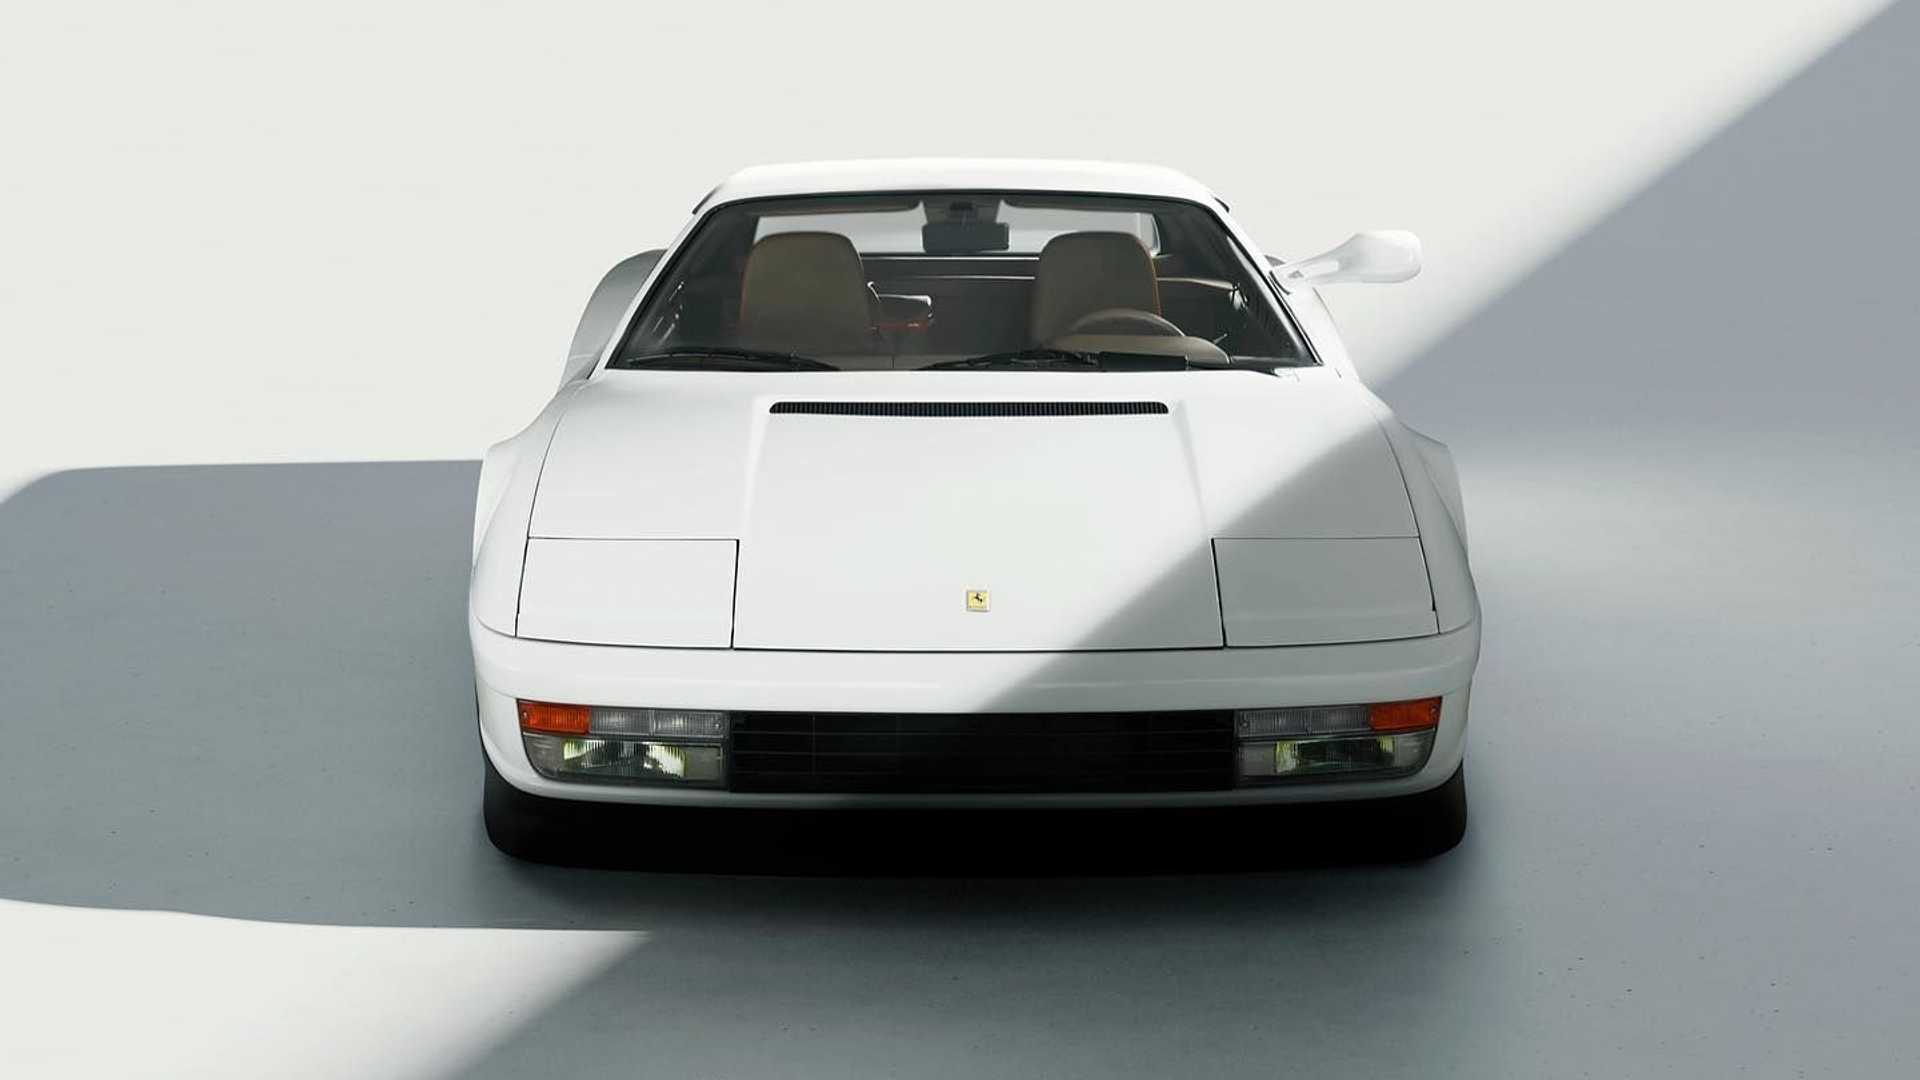 Ferrari-Testarossa-restomod-Officine-Fioravanti-5